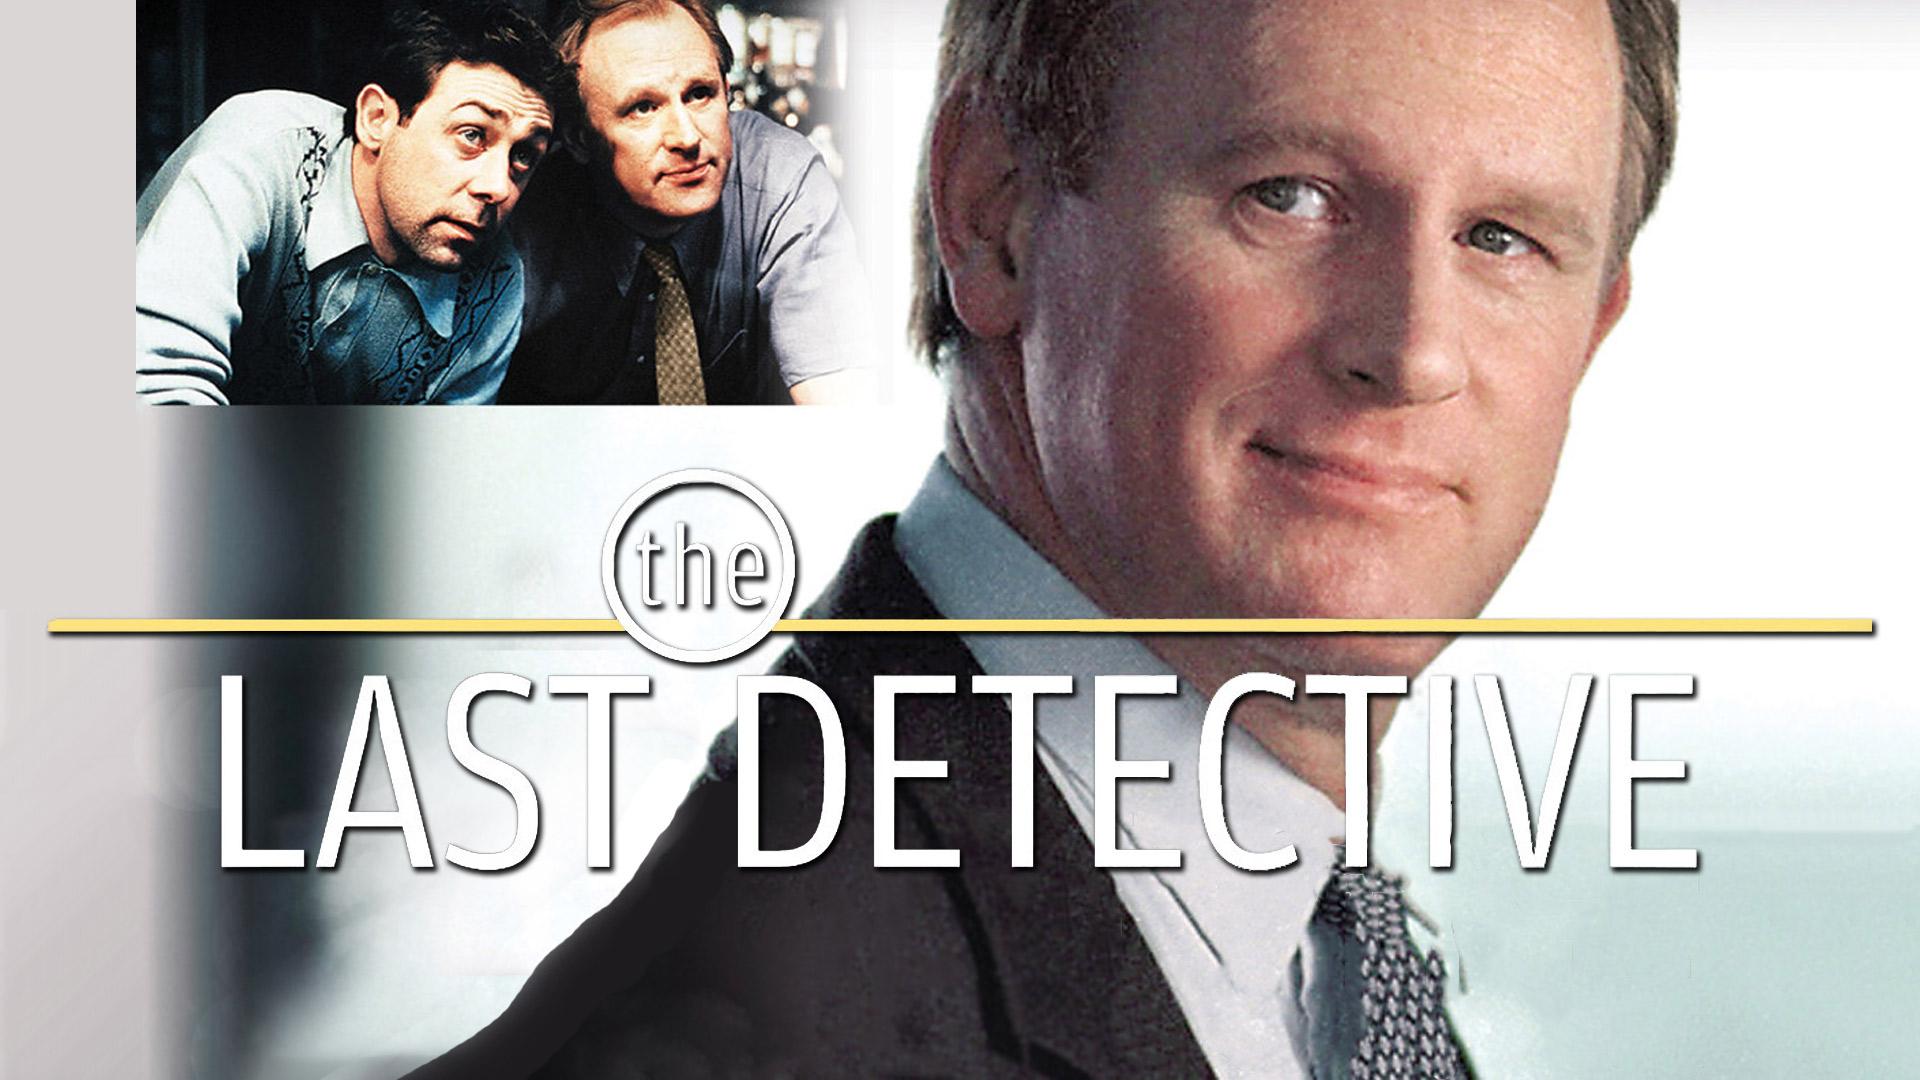 The Last Detective Season 1